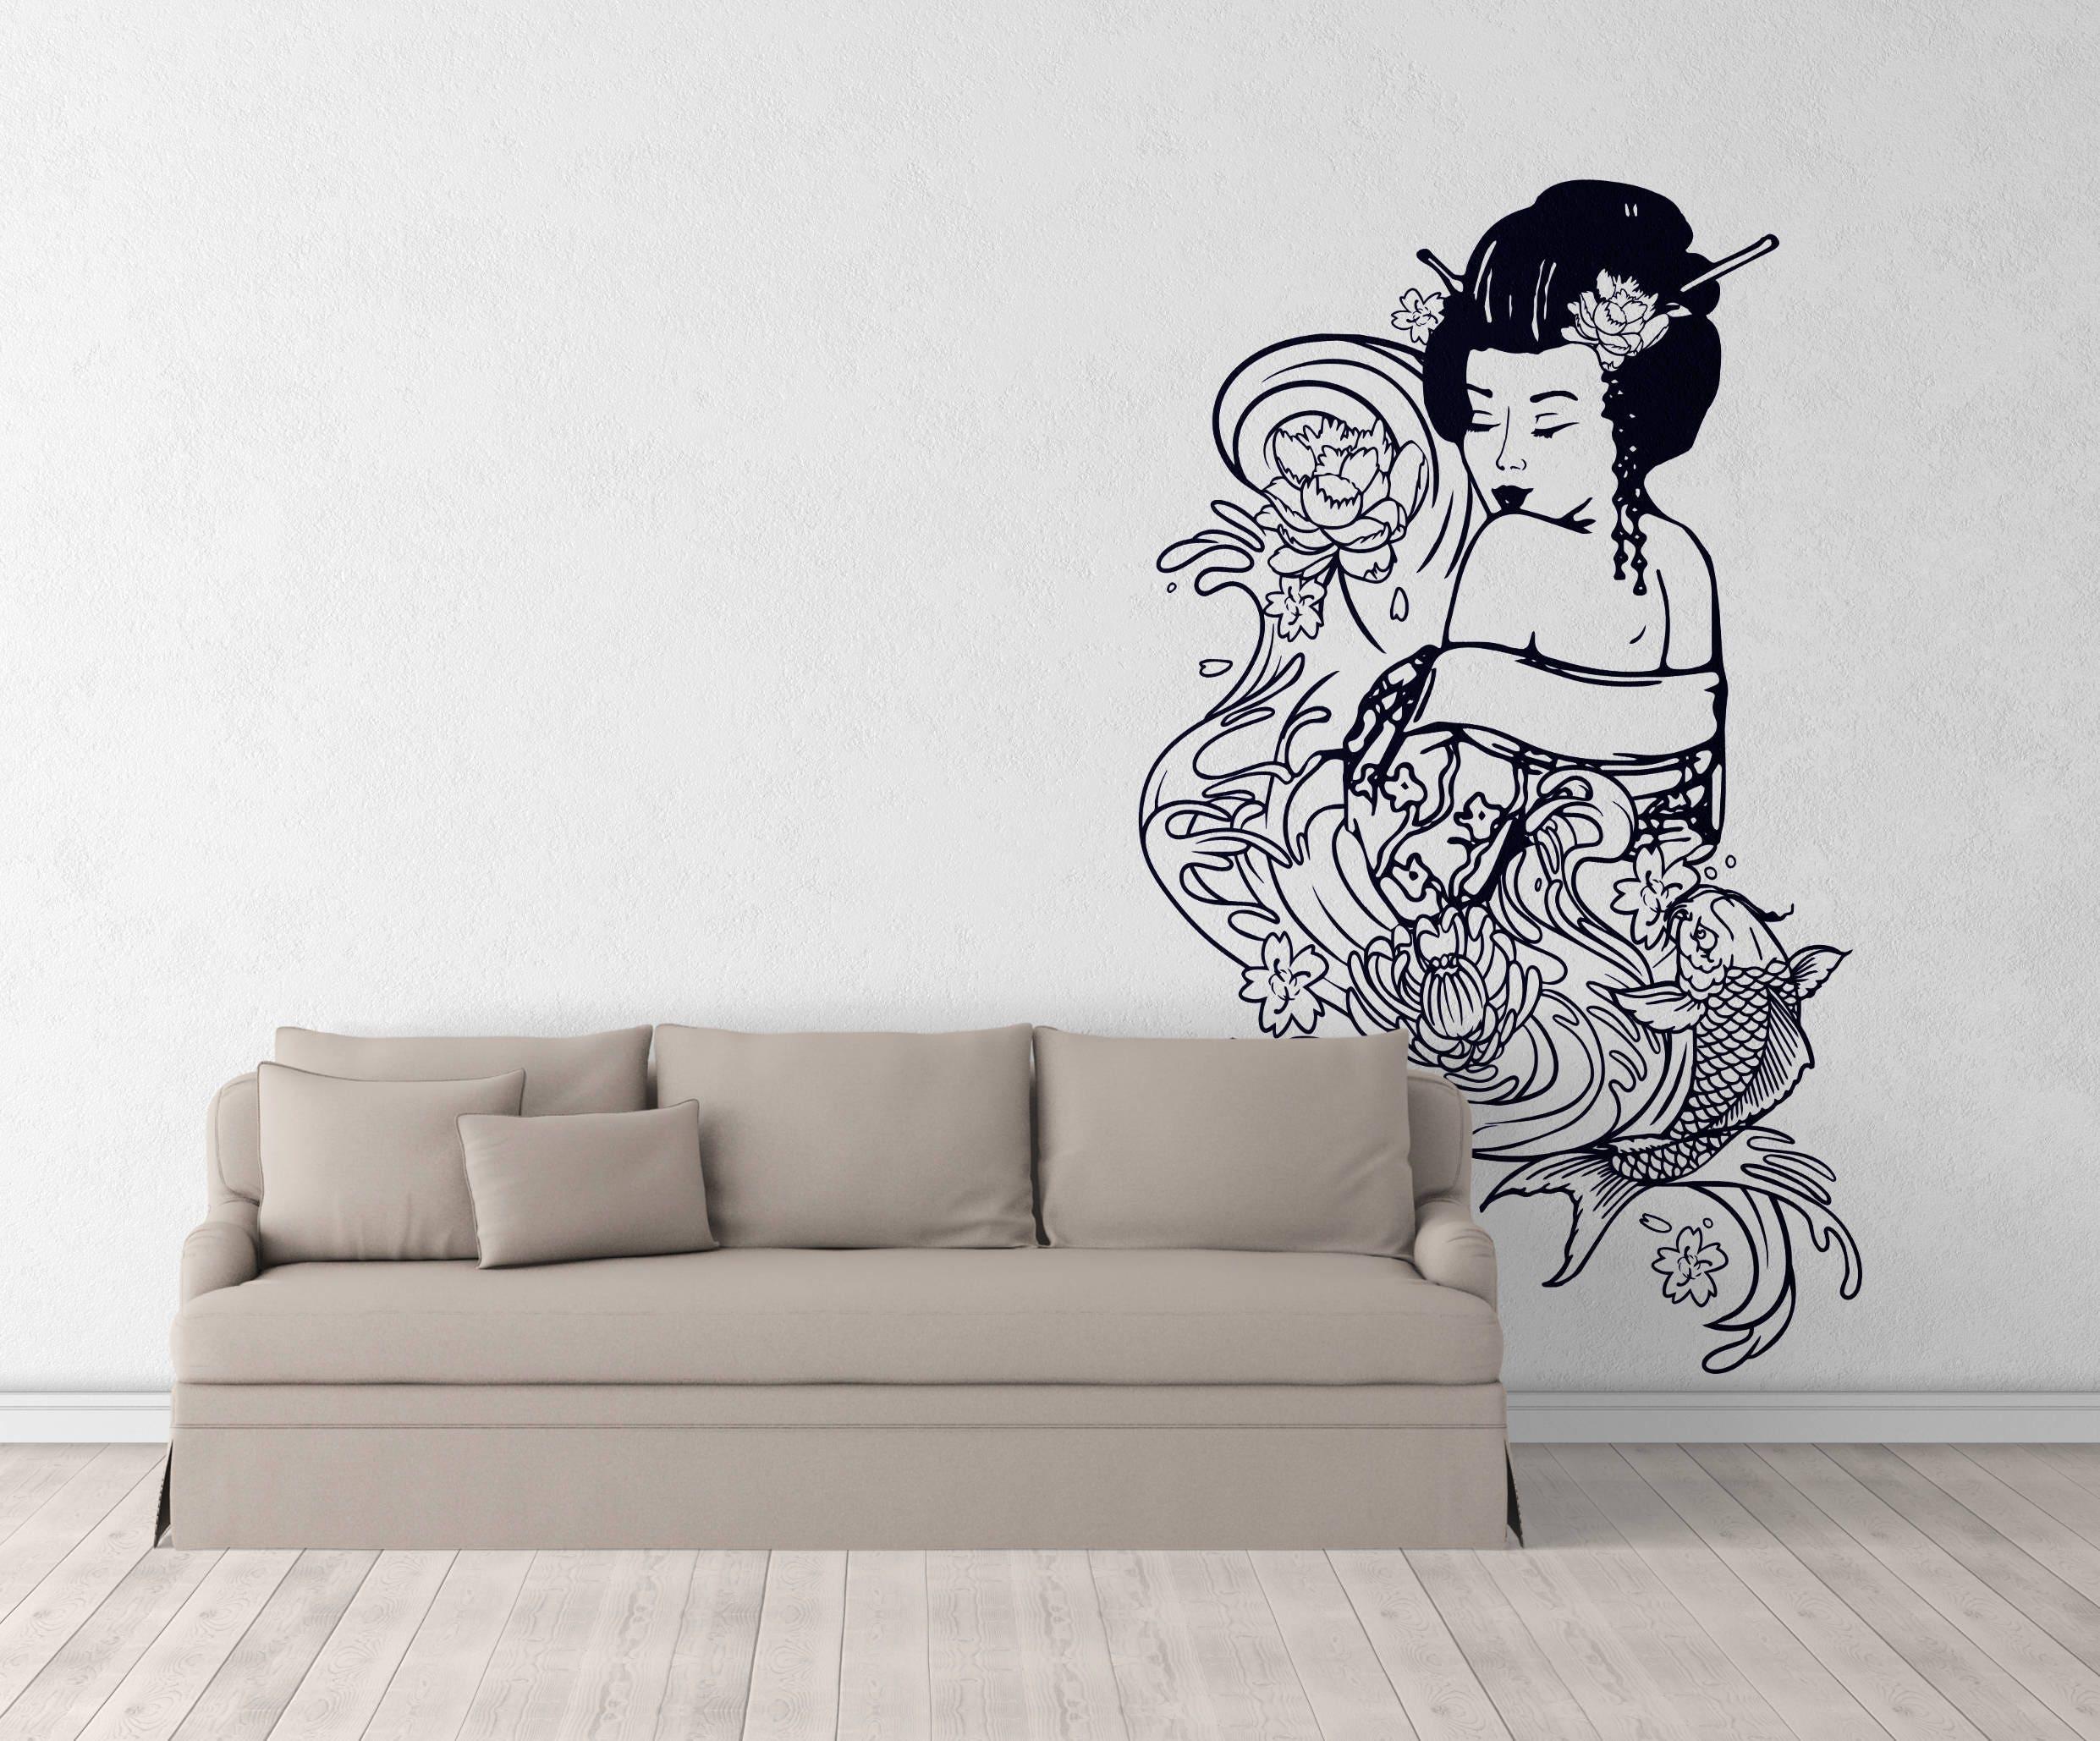 Japanese geisha woman with carp koi geisha woman in feudal japan interior vinyl decal sticker for wall decor samurai courage